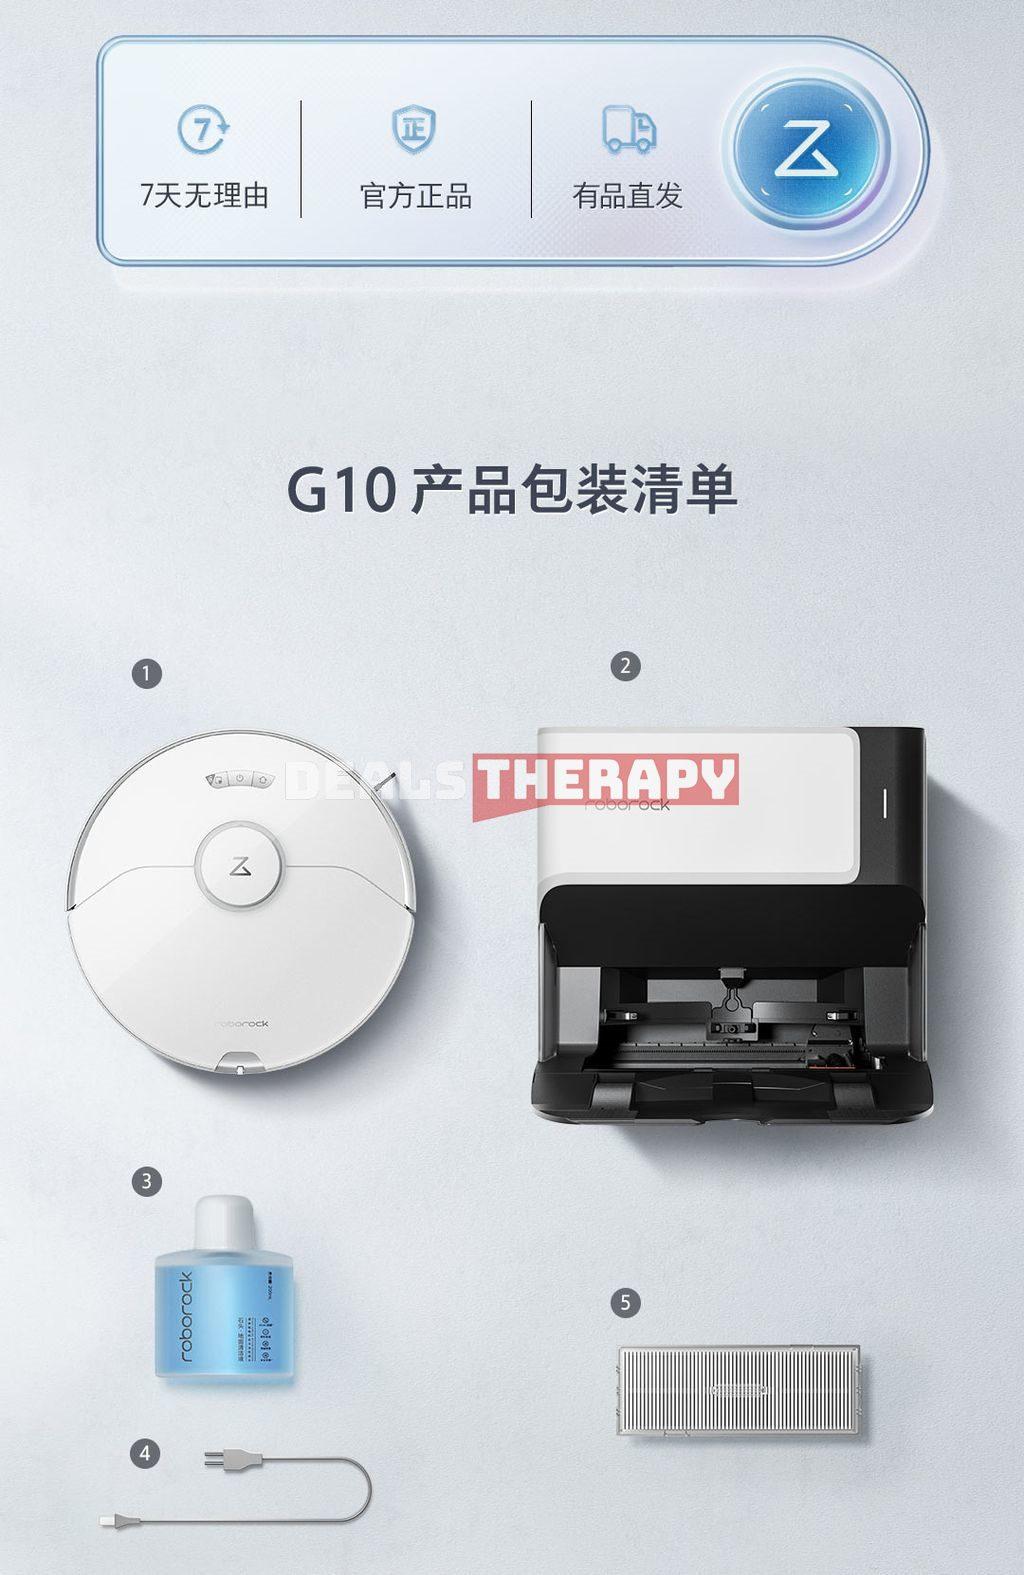 Roborock G10